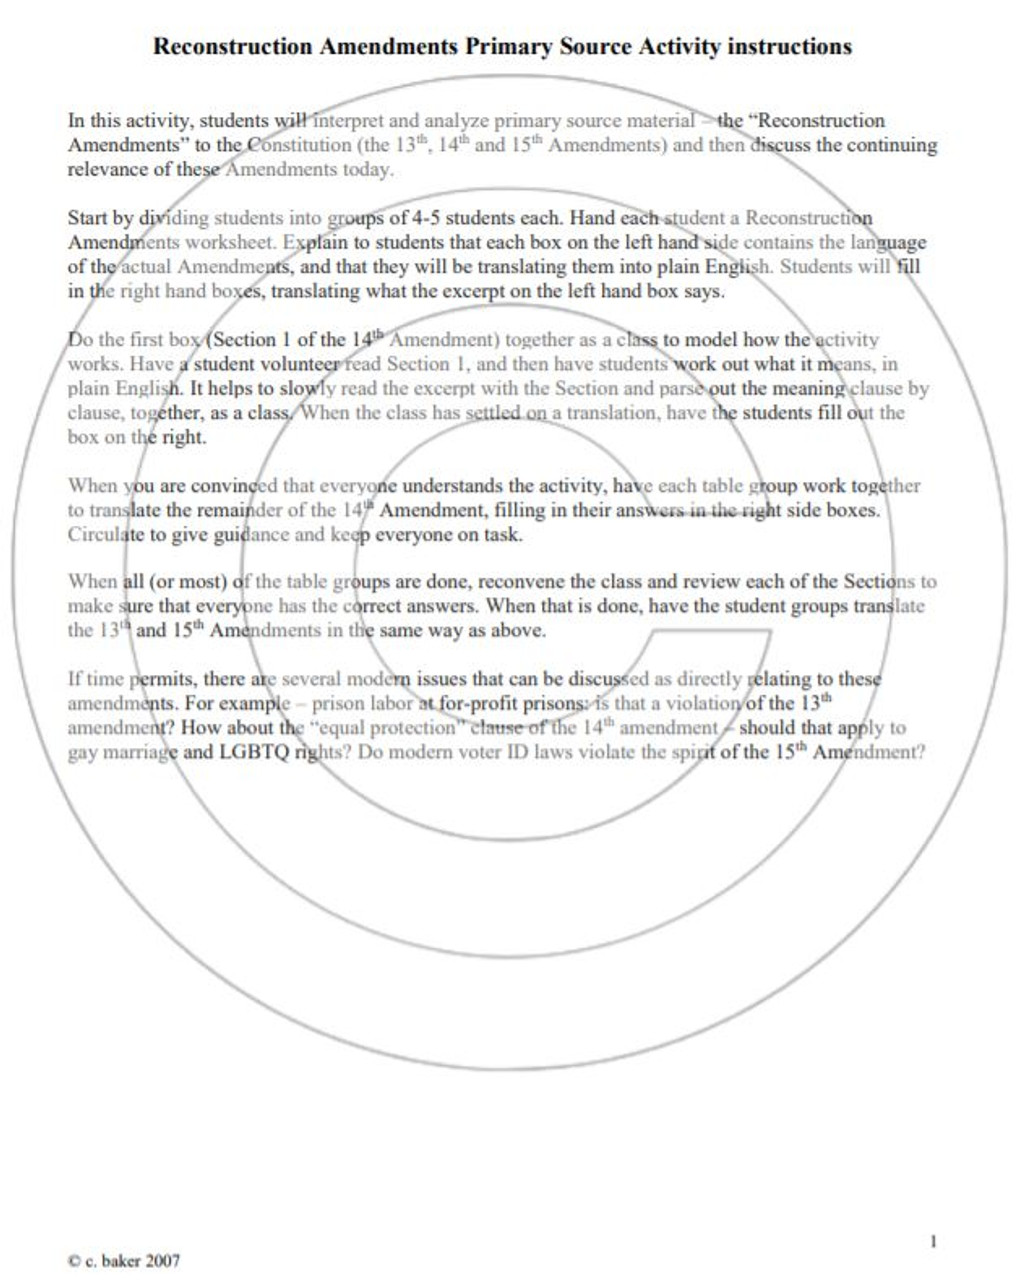 Reconstruction Amendments Primary Source Analysis Activity